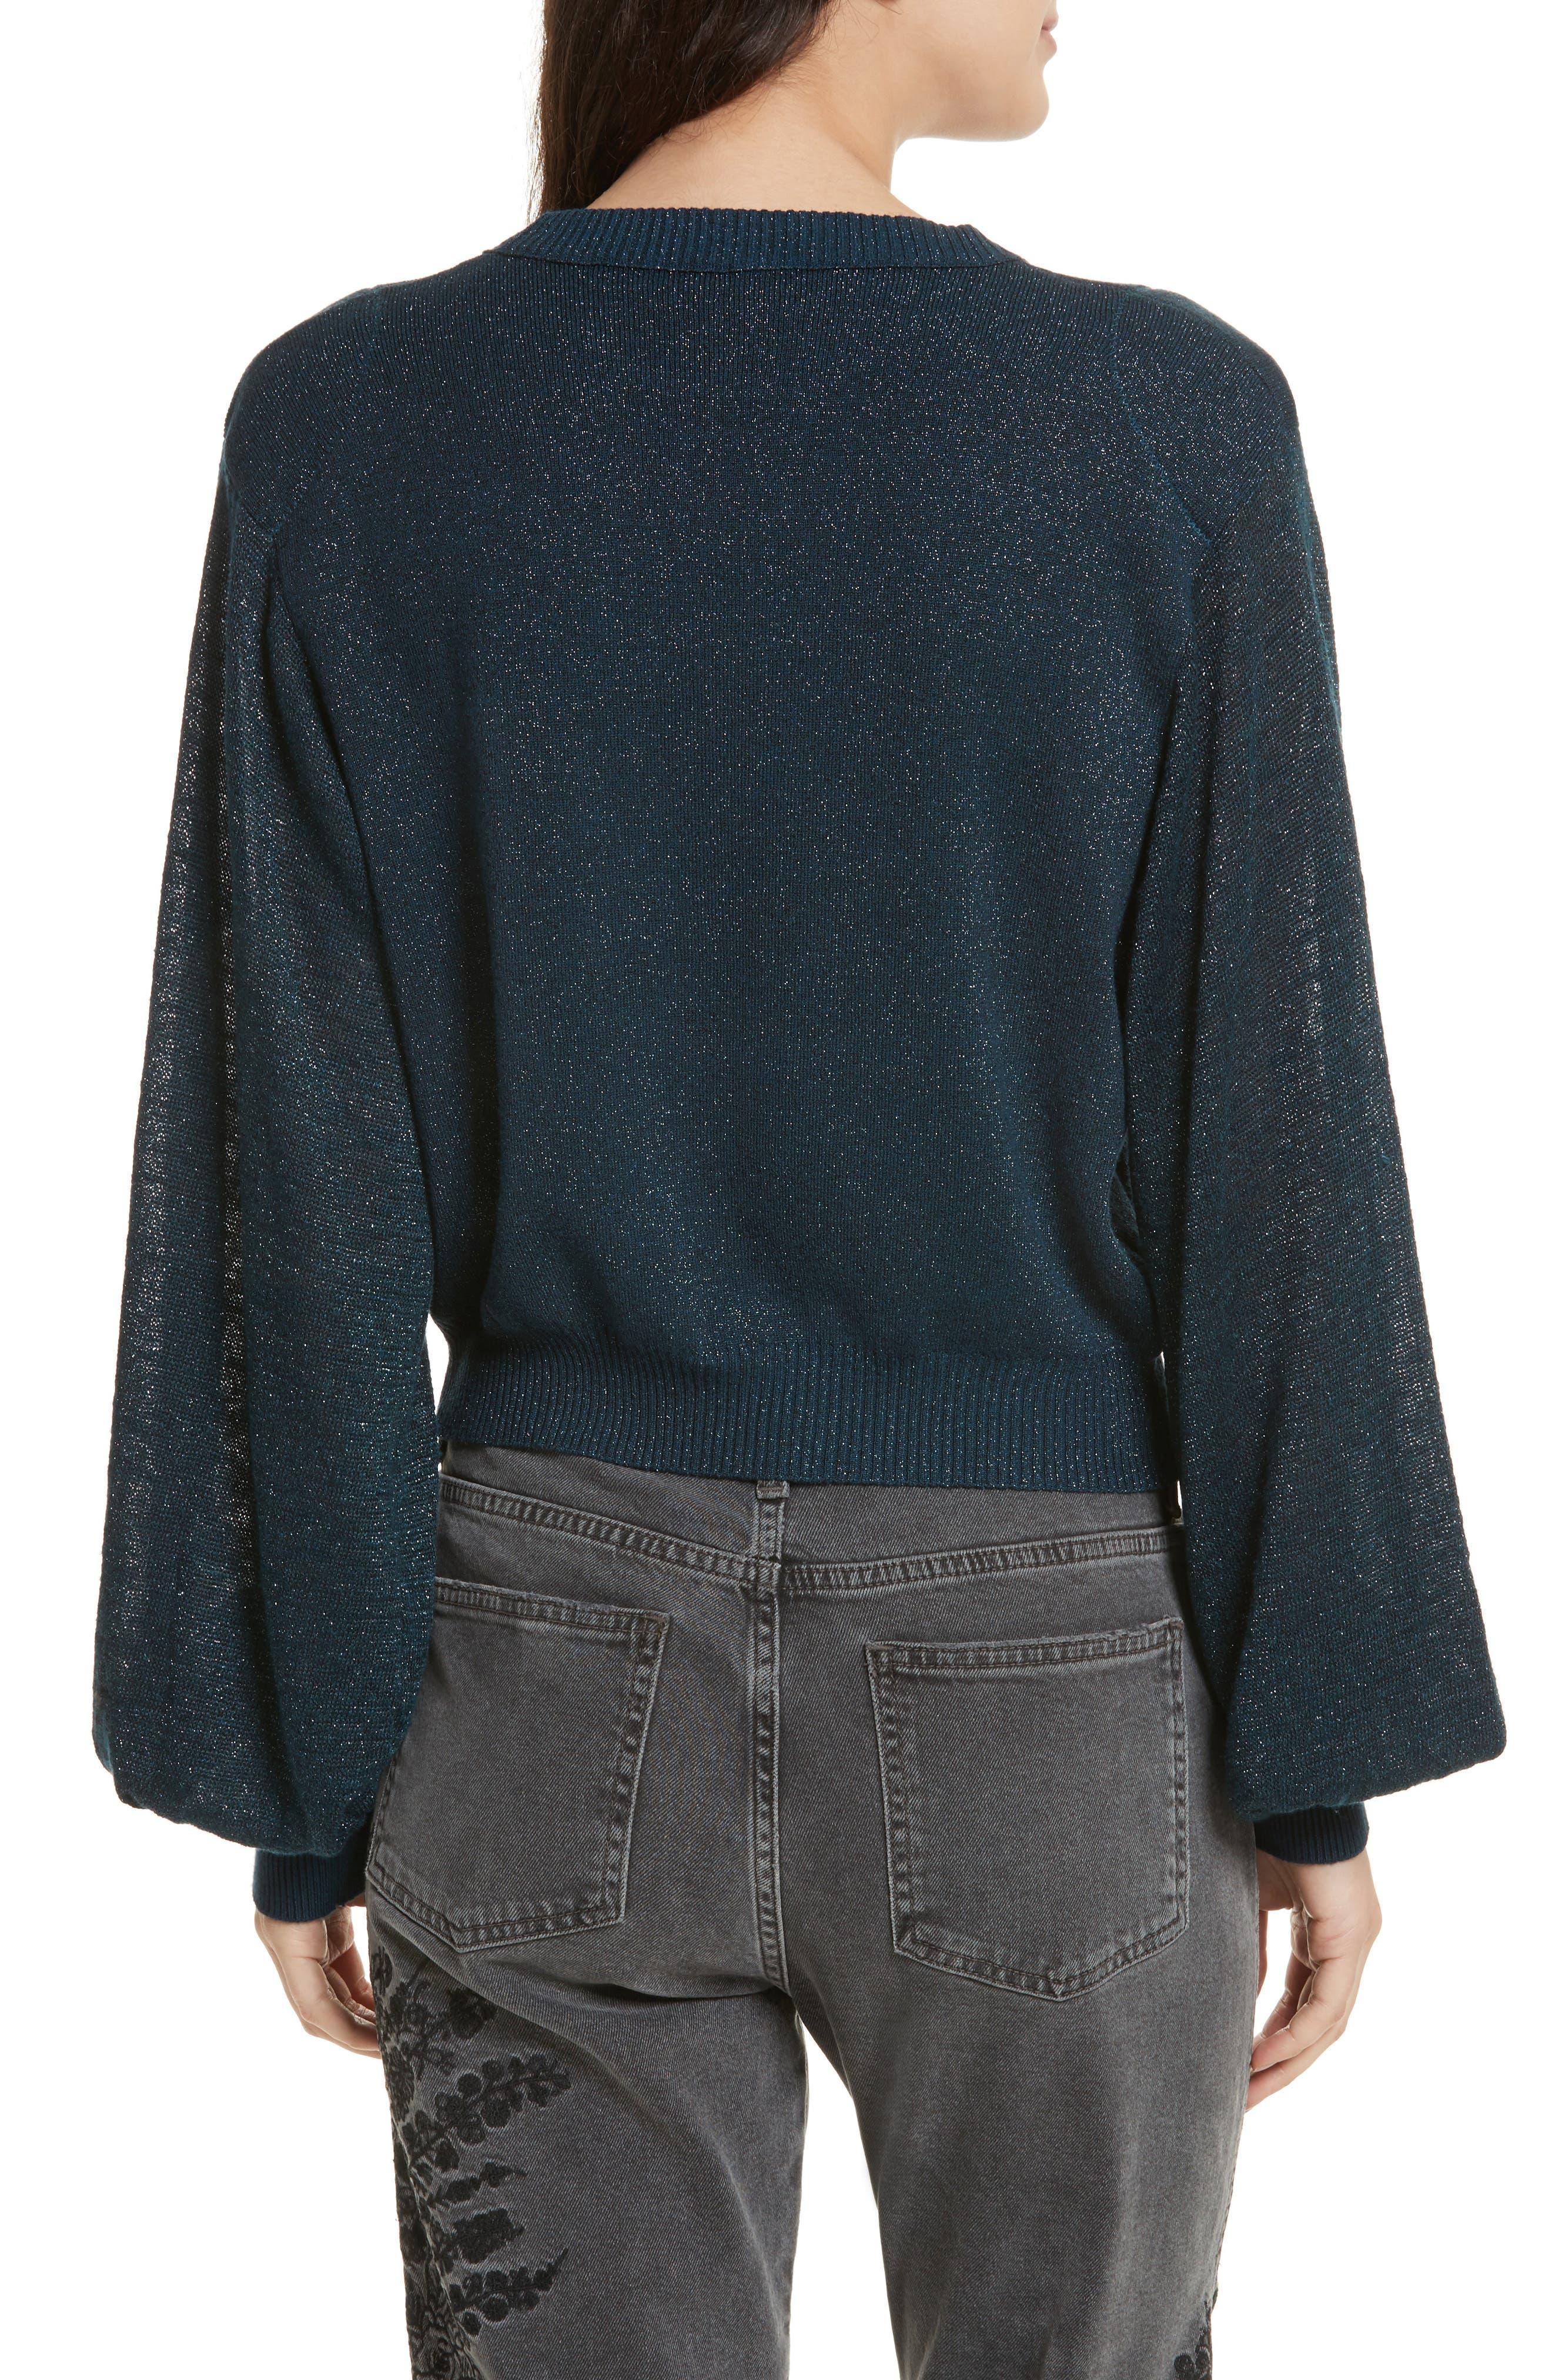 Let it Shine Sweater,                             Alternate thumbnail 2, color,                             Navy